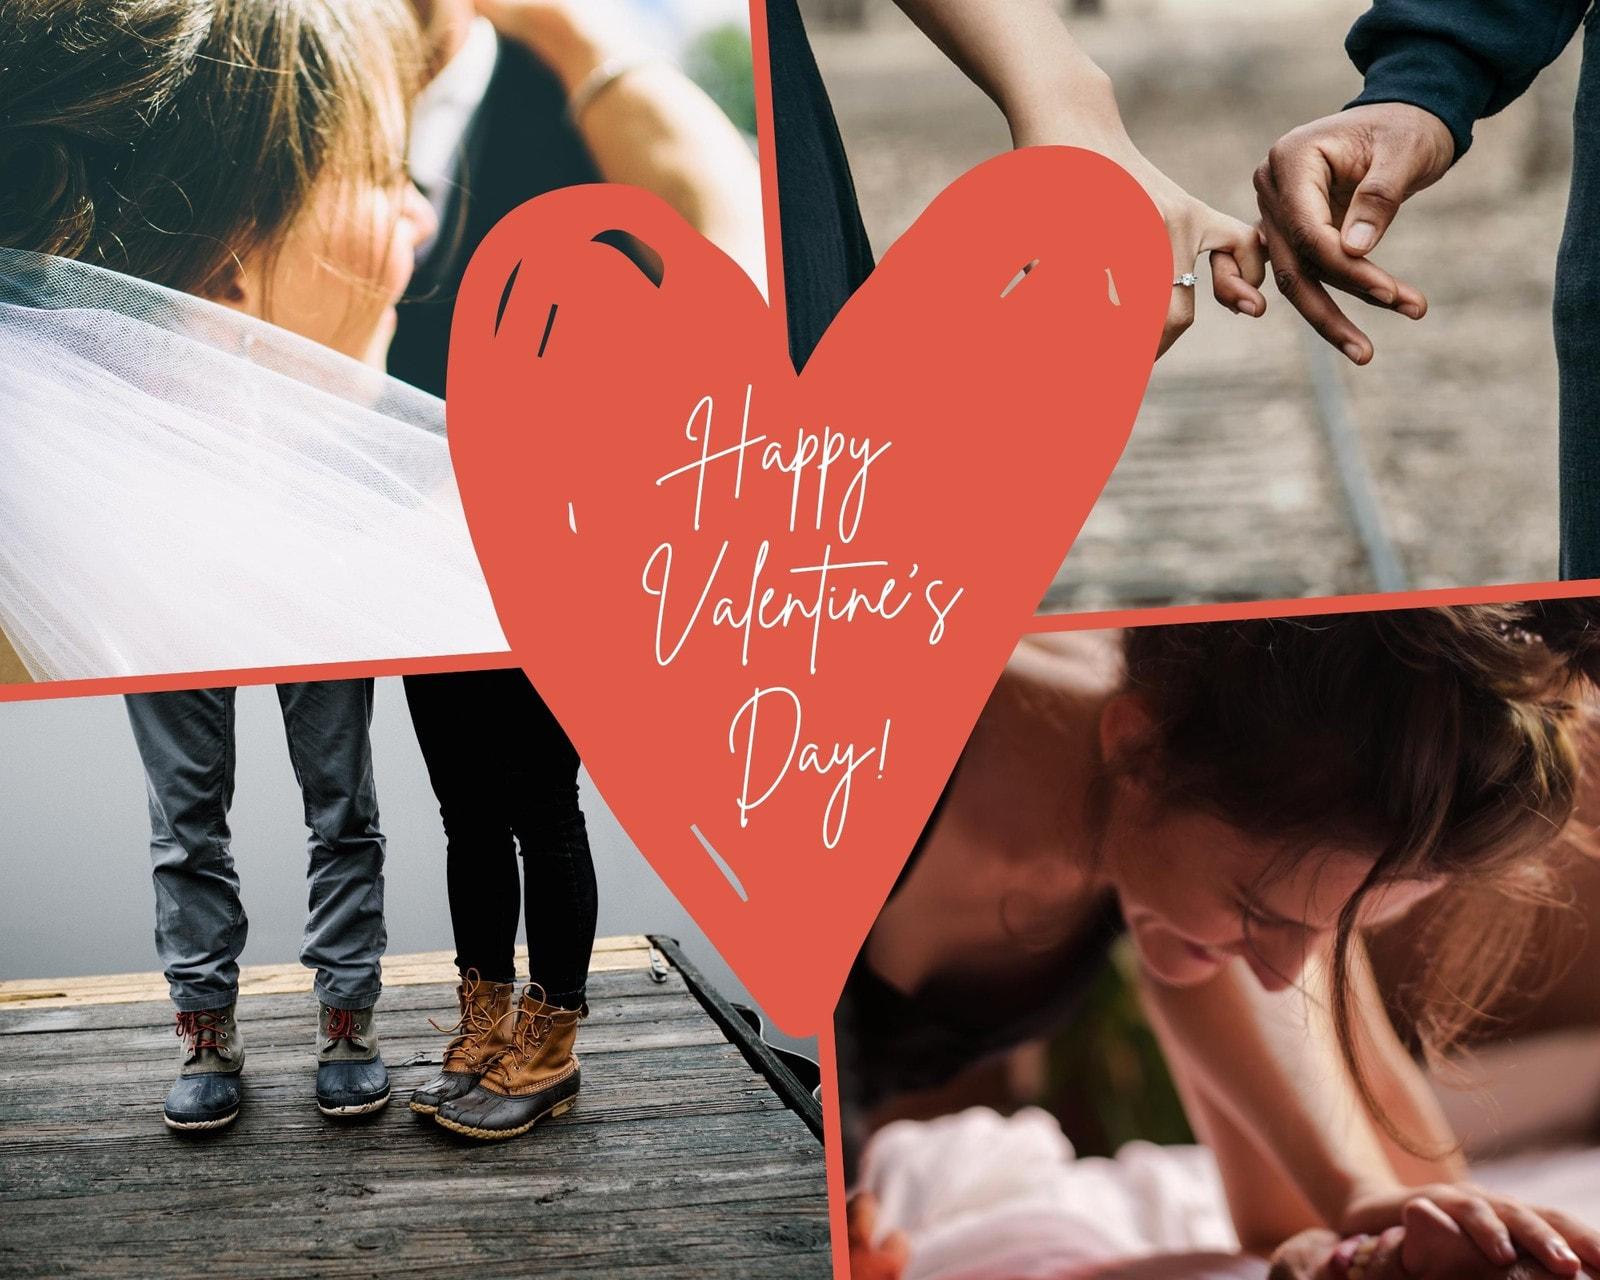 Red Heart Monochrome Photo Valentine's Day Photo Collage